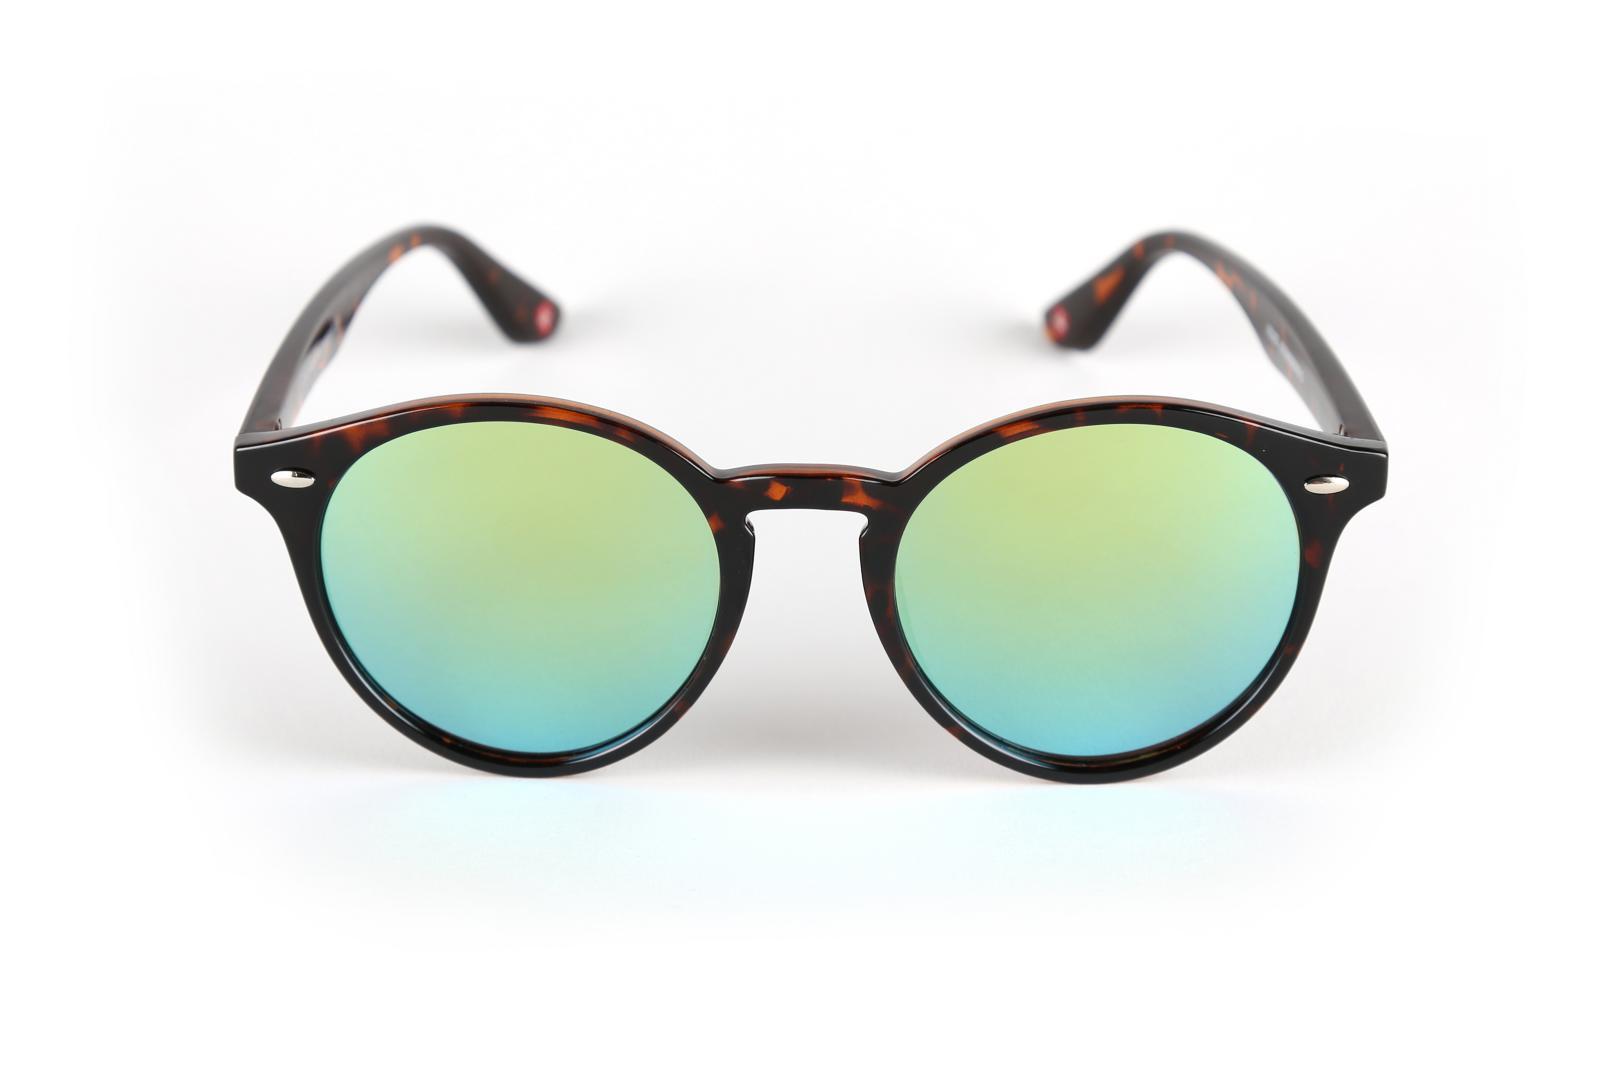 Montana Eyewear MS20-Havanna-Grün Z4OCO6rQRe